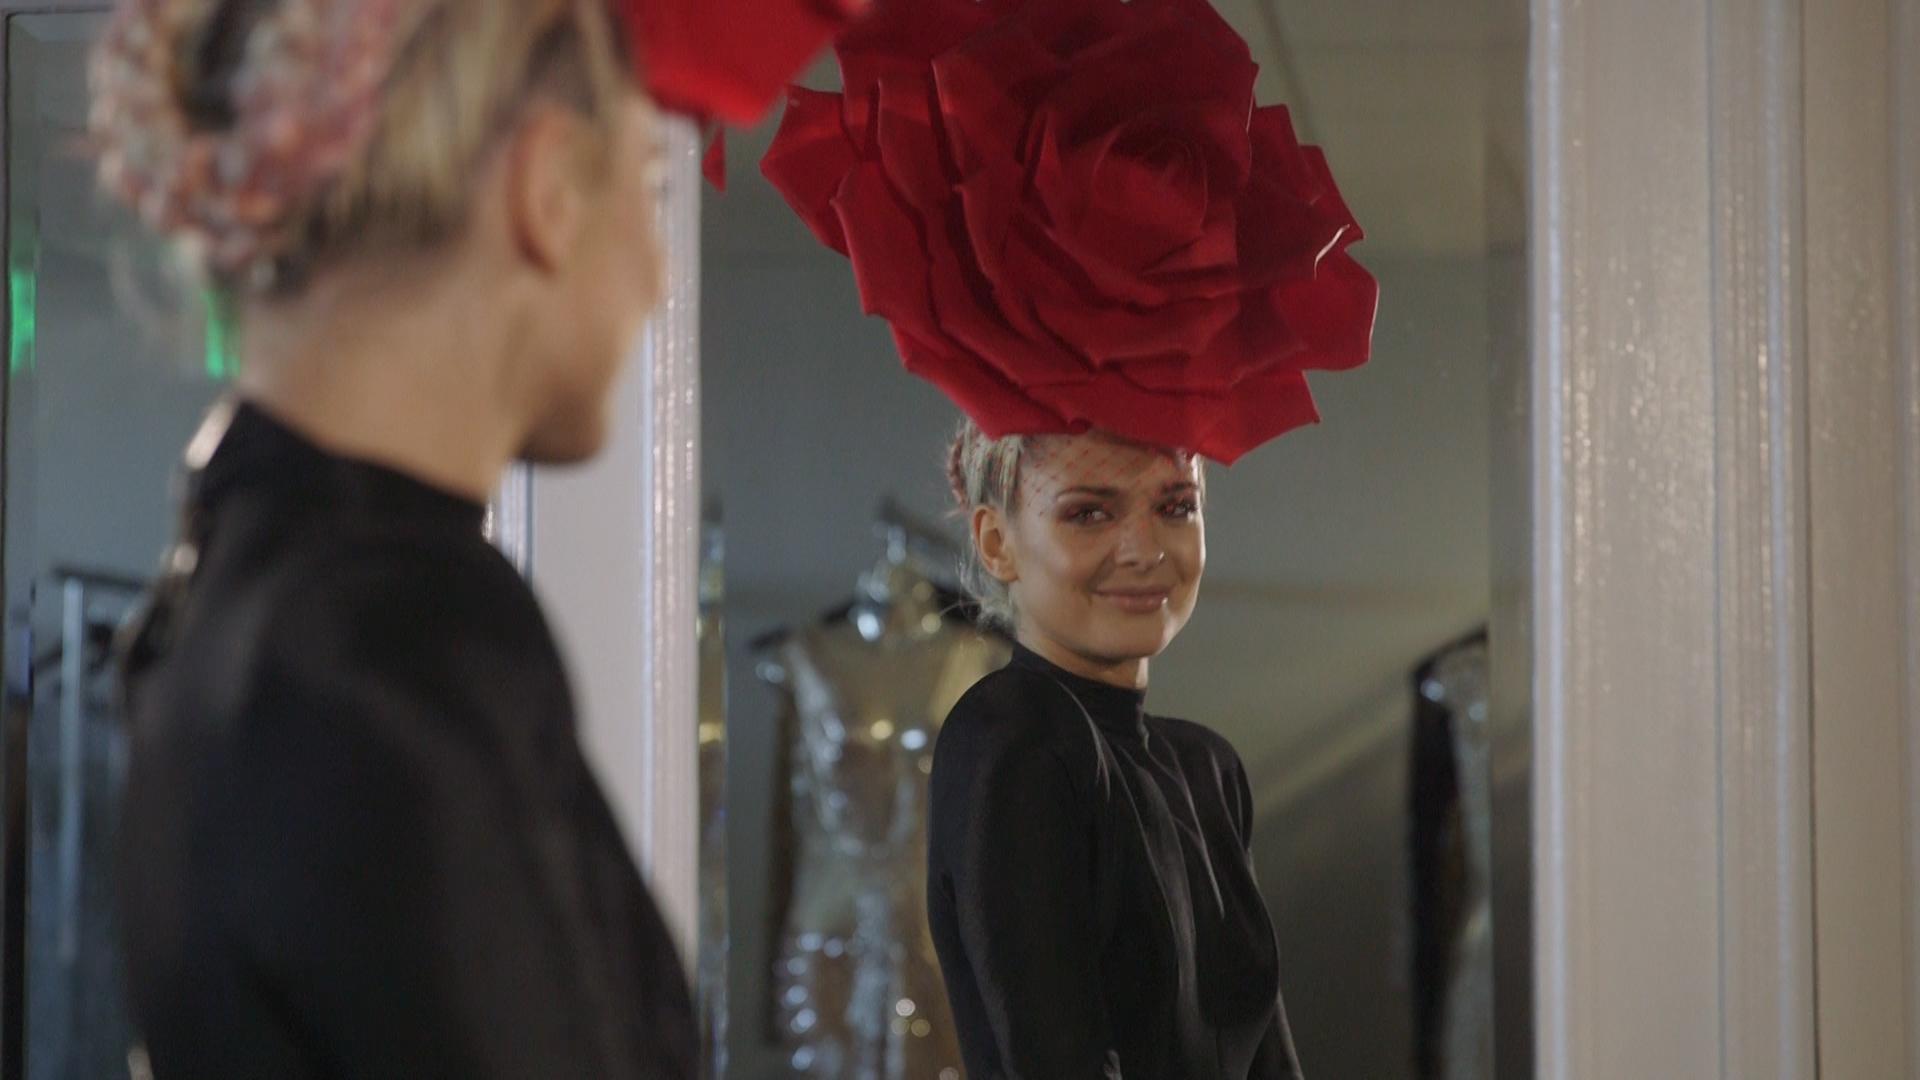 Arturo Rios Flower Hat Model Smiling.jpg